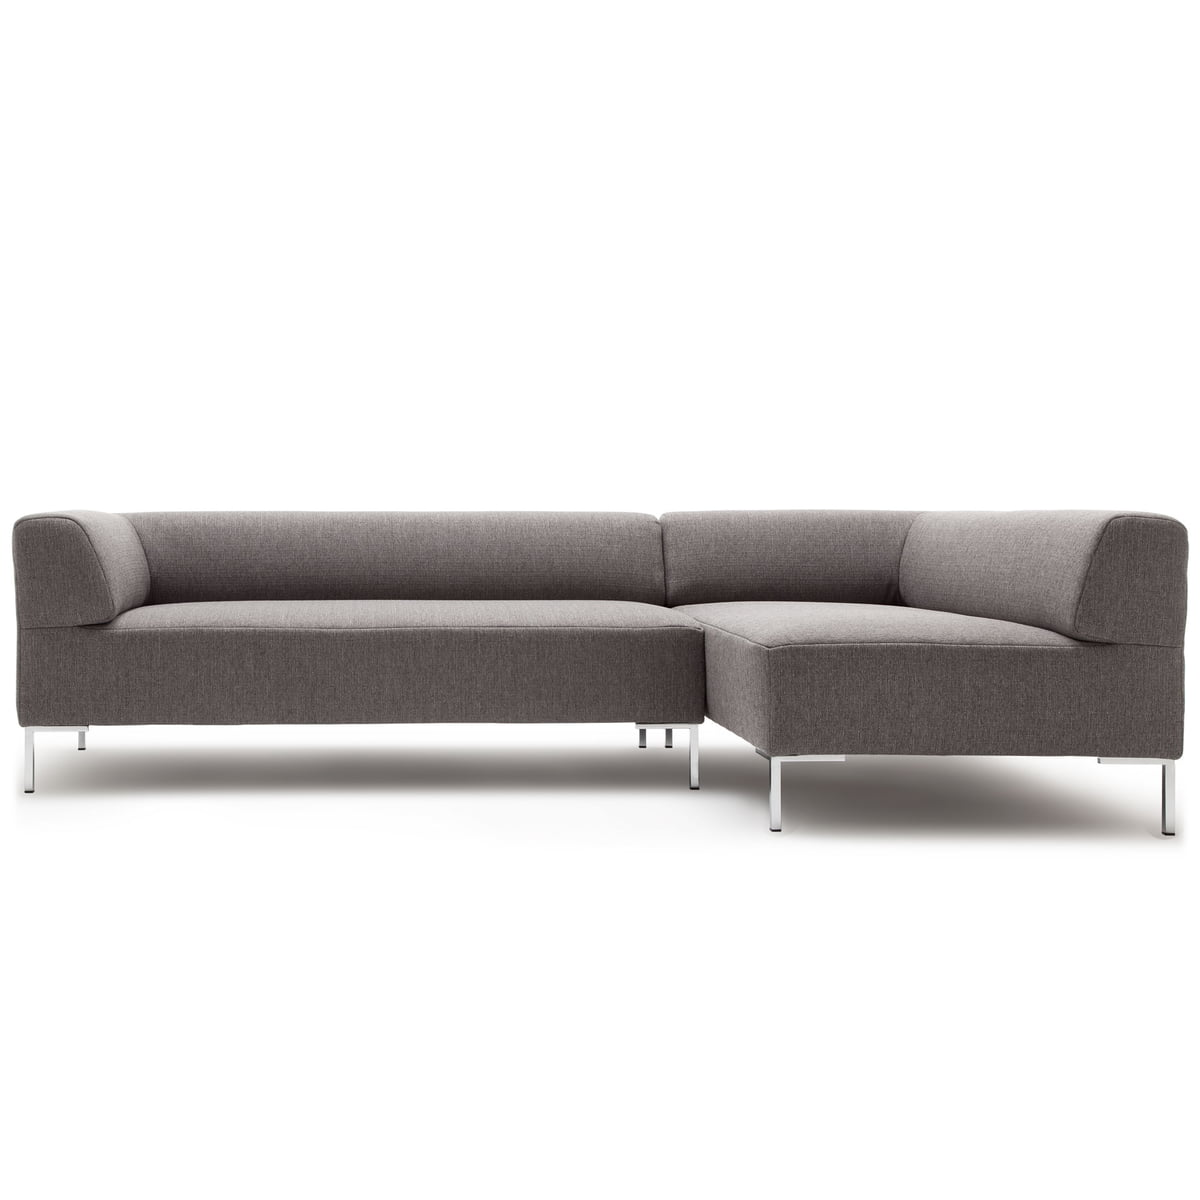 freistil - corner 185 sofa | Connox